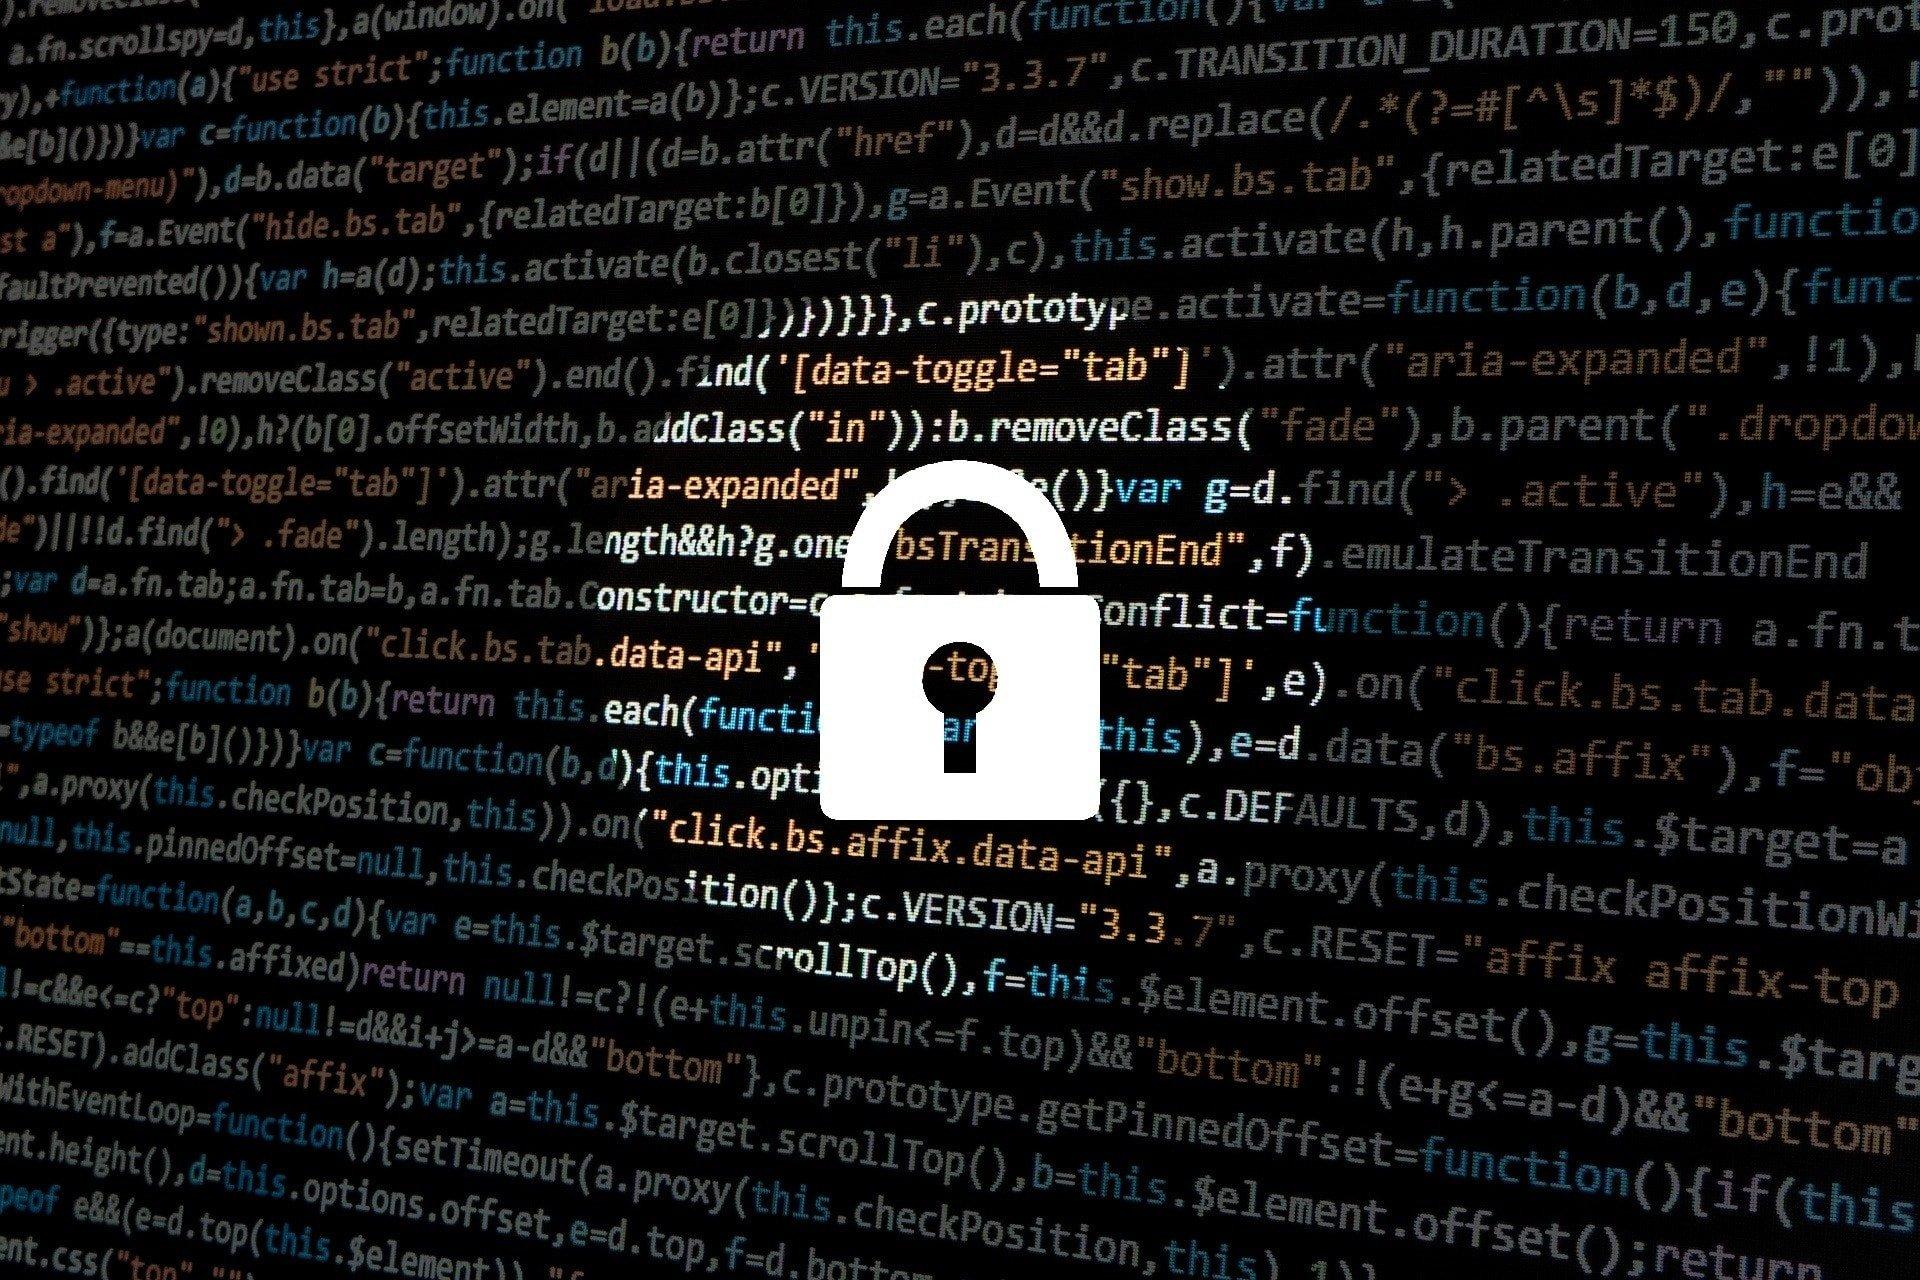 jak zvolit silne heslo